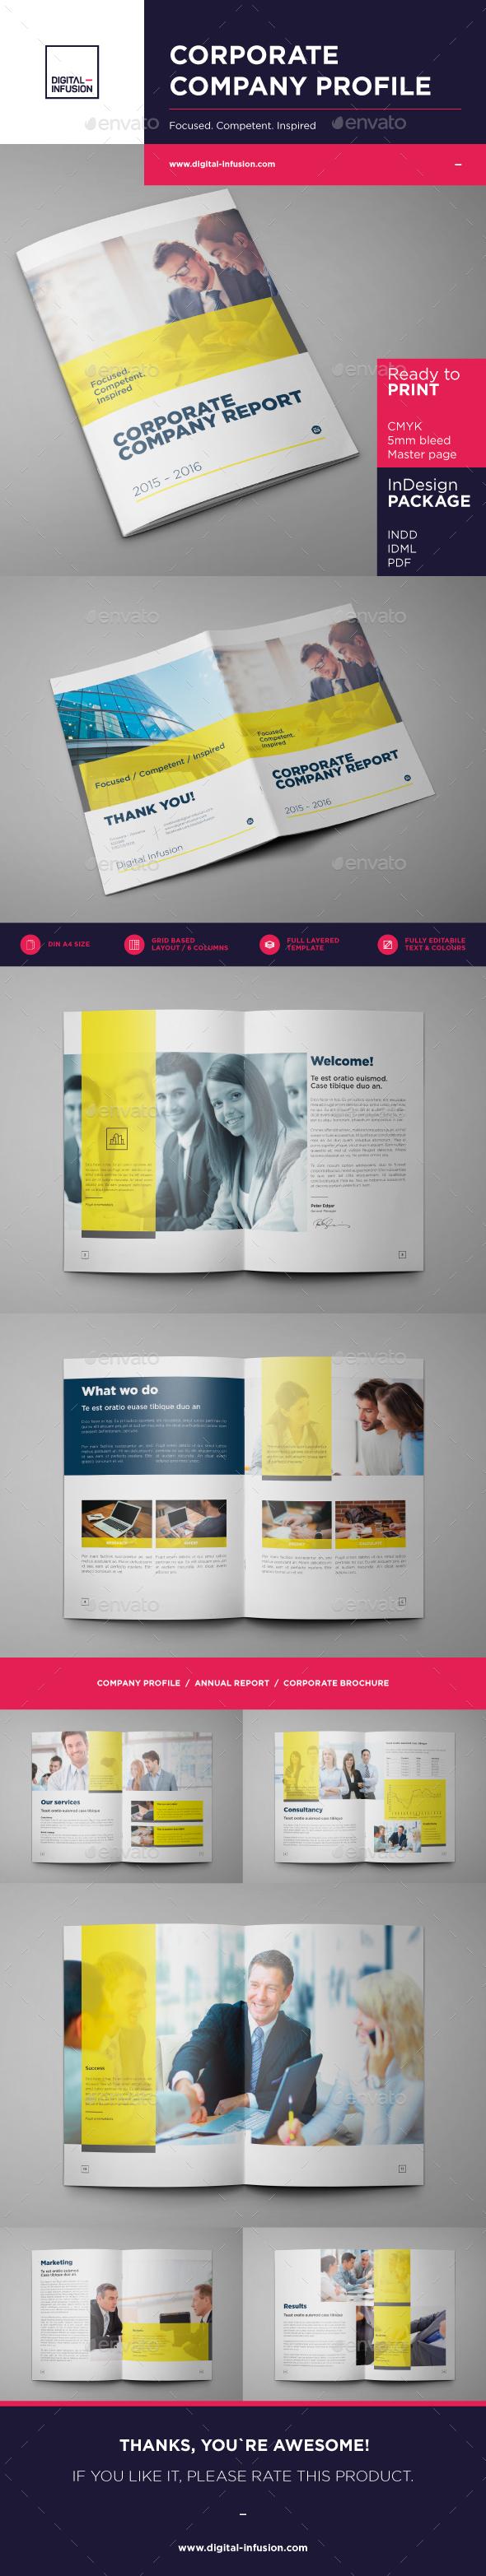 Corporate Company Profile - Corporate Brochures